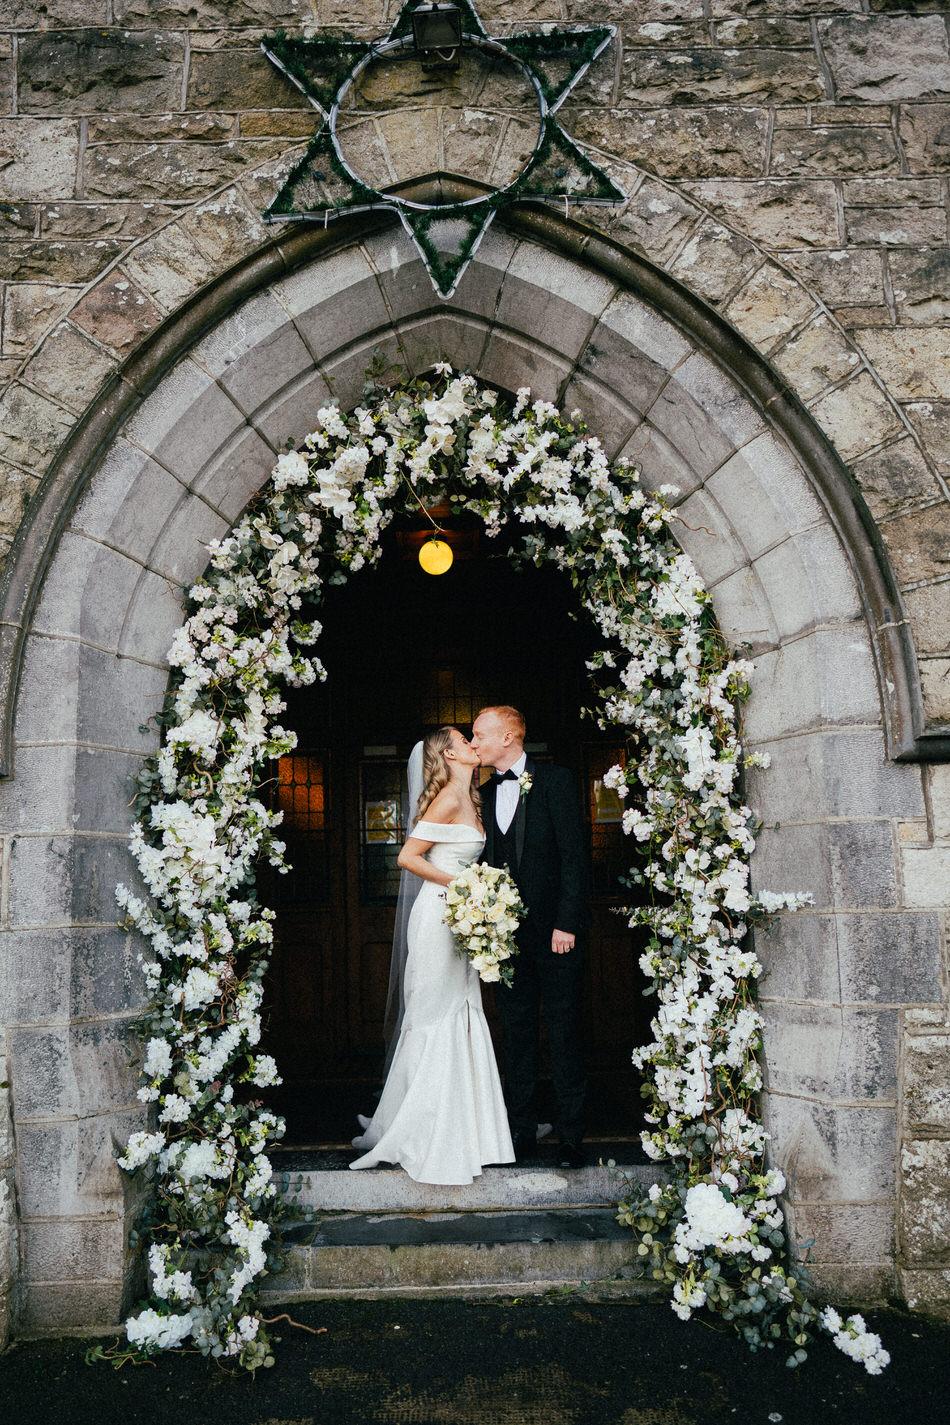 Castle-wedding-ireland-photos- 0149 101